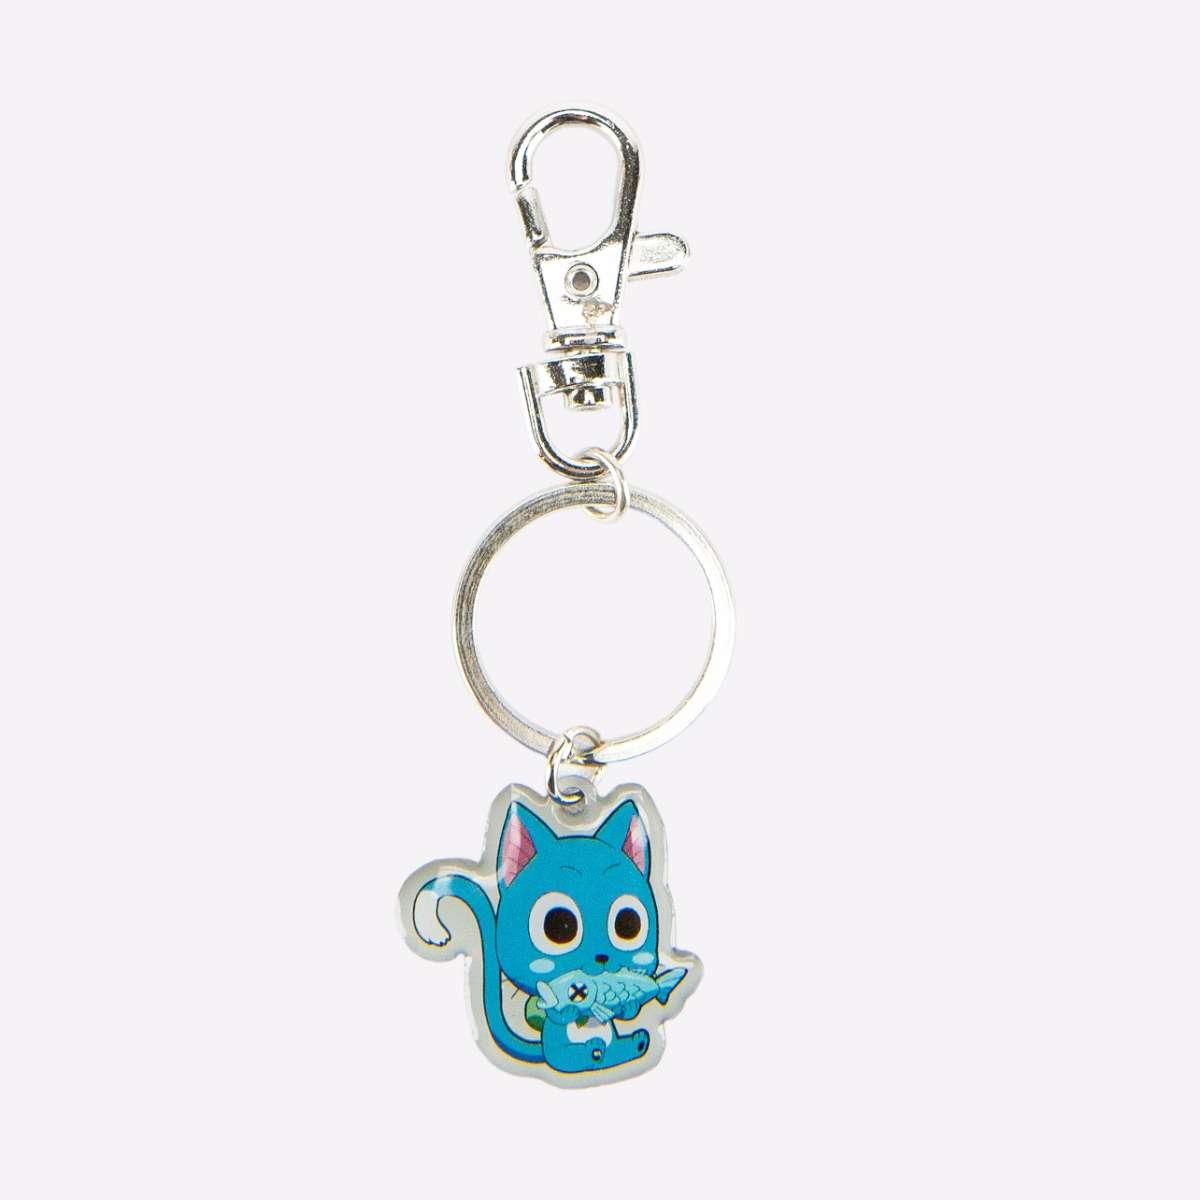 Happy Metal Keychain accessories